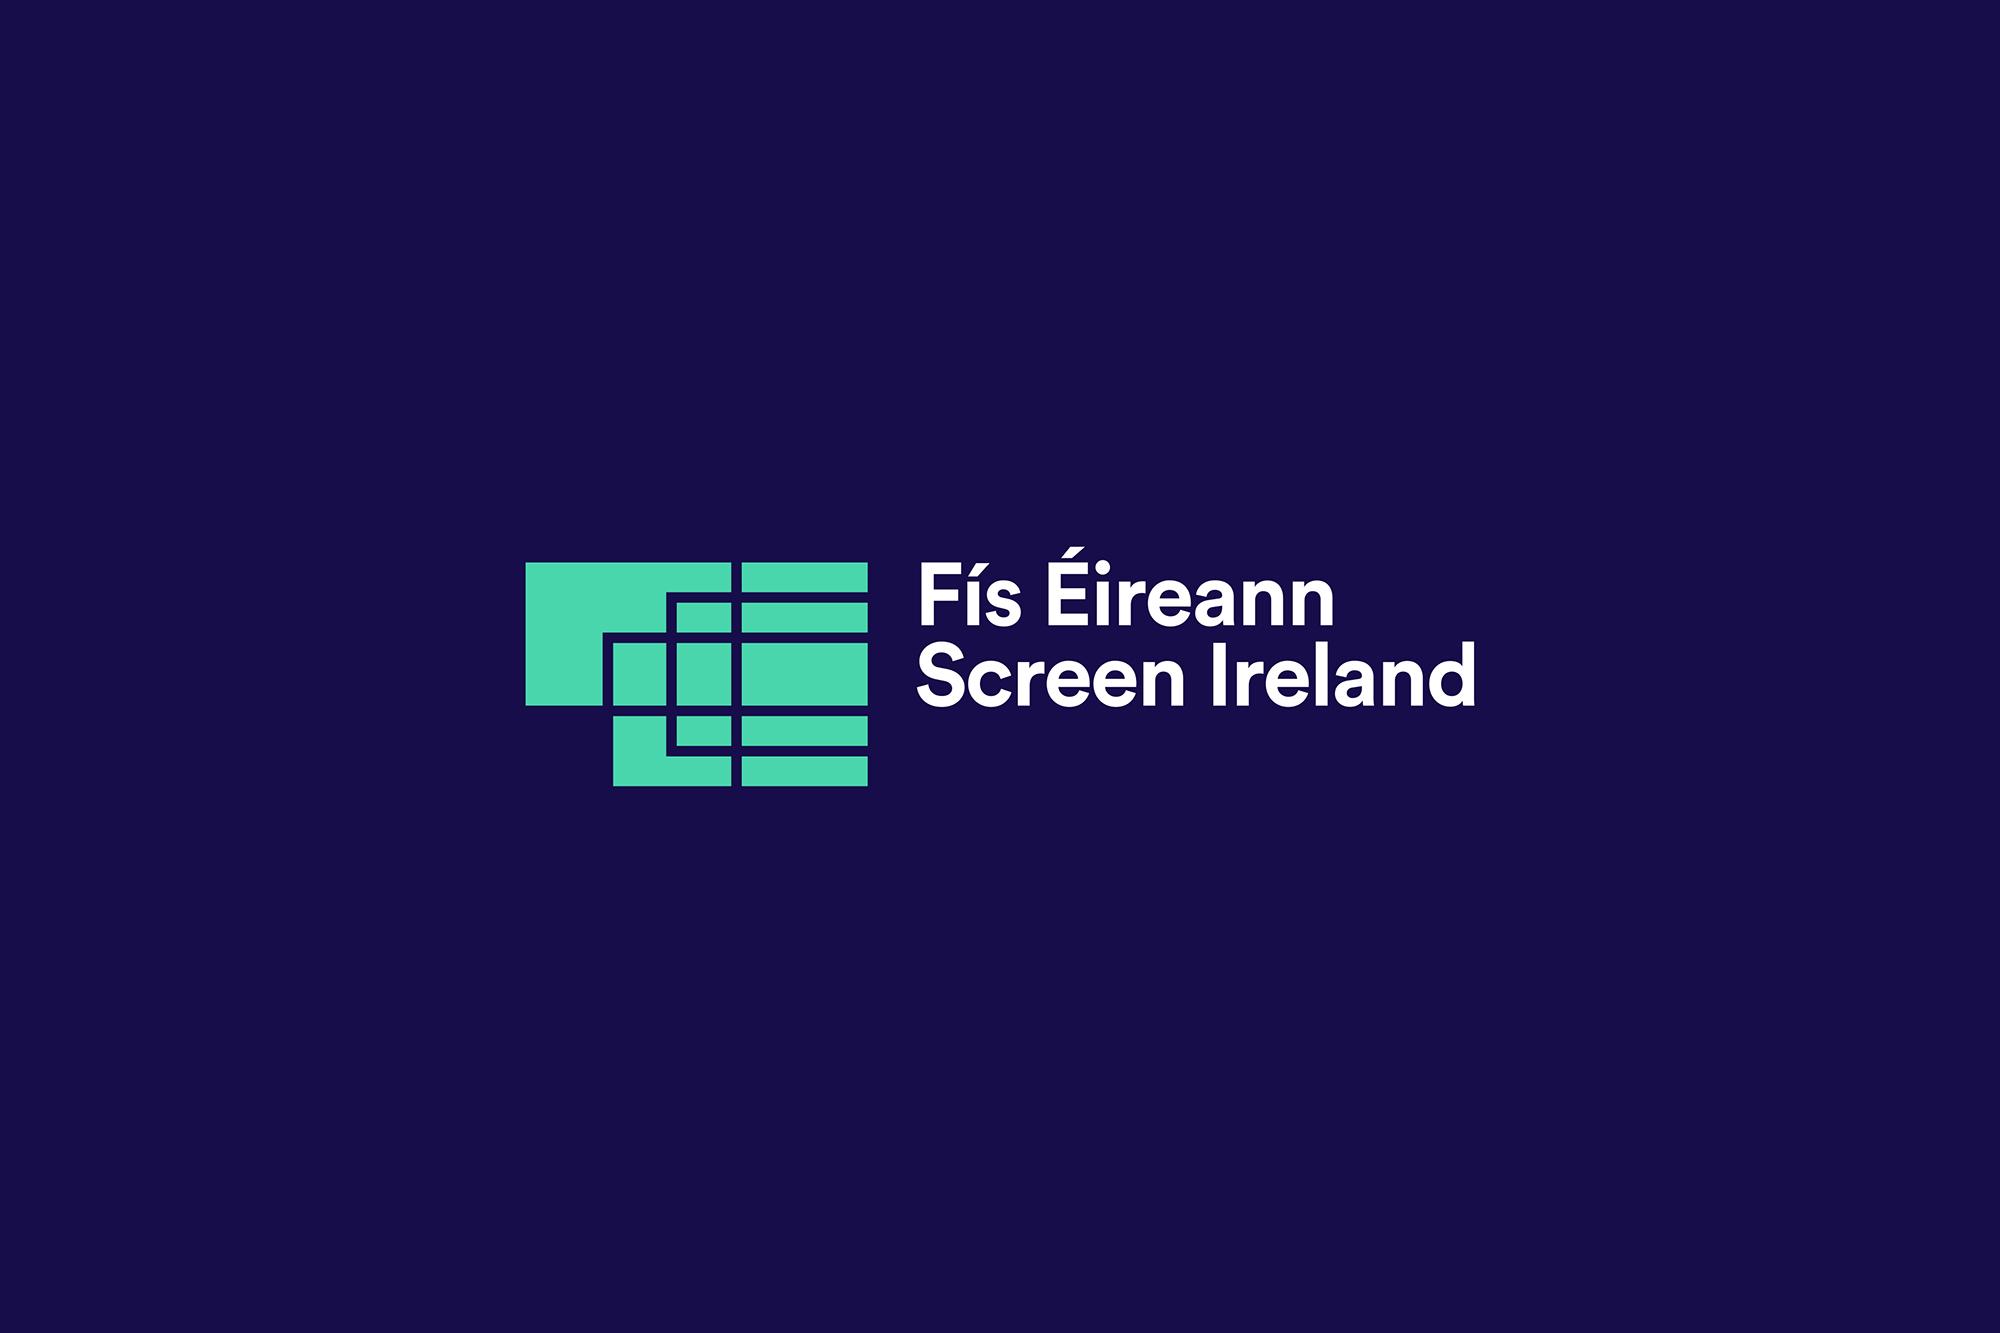 Cover image: Screen Ireland Identity